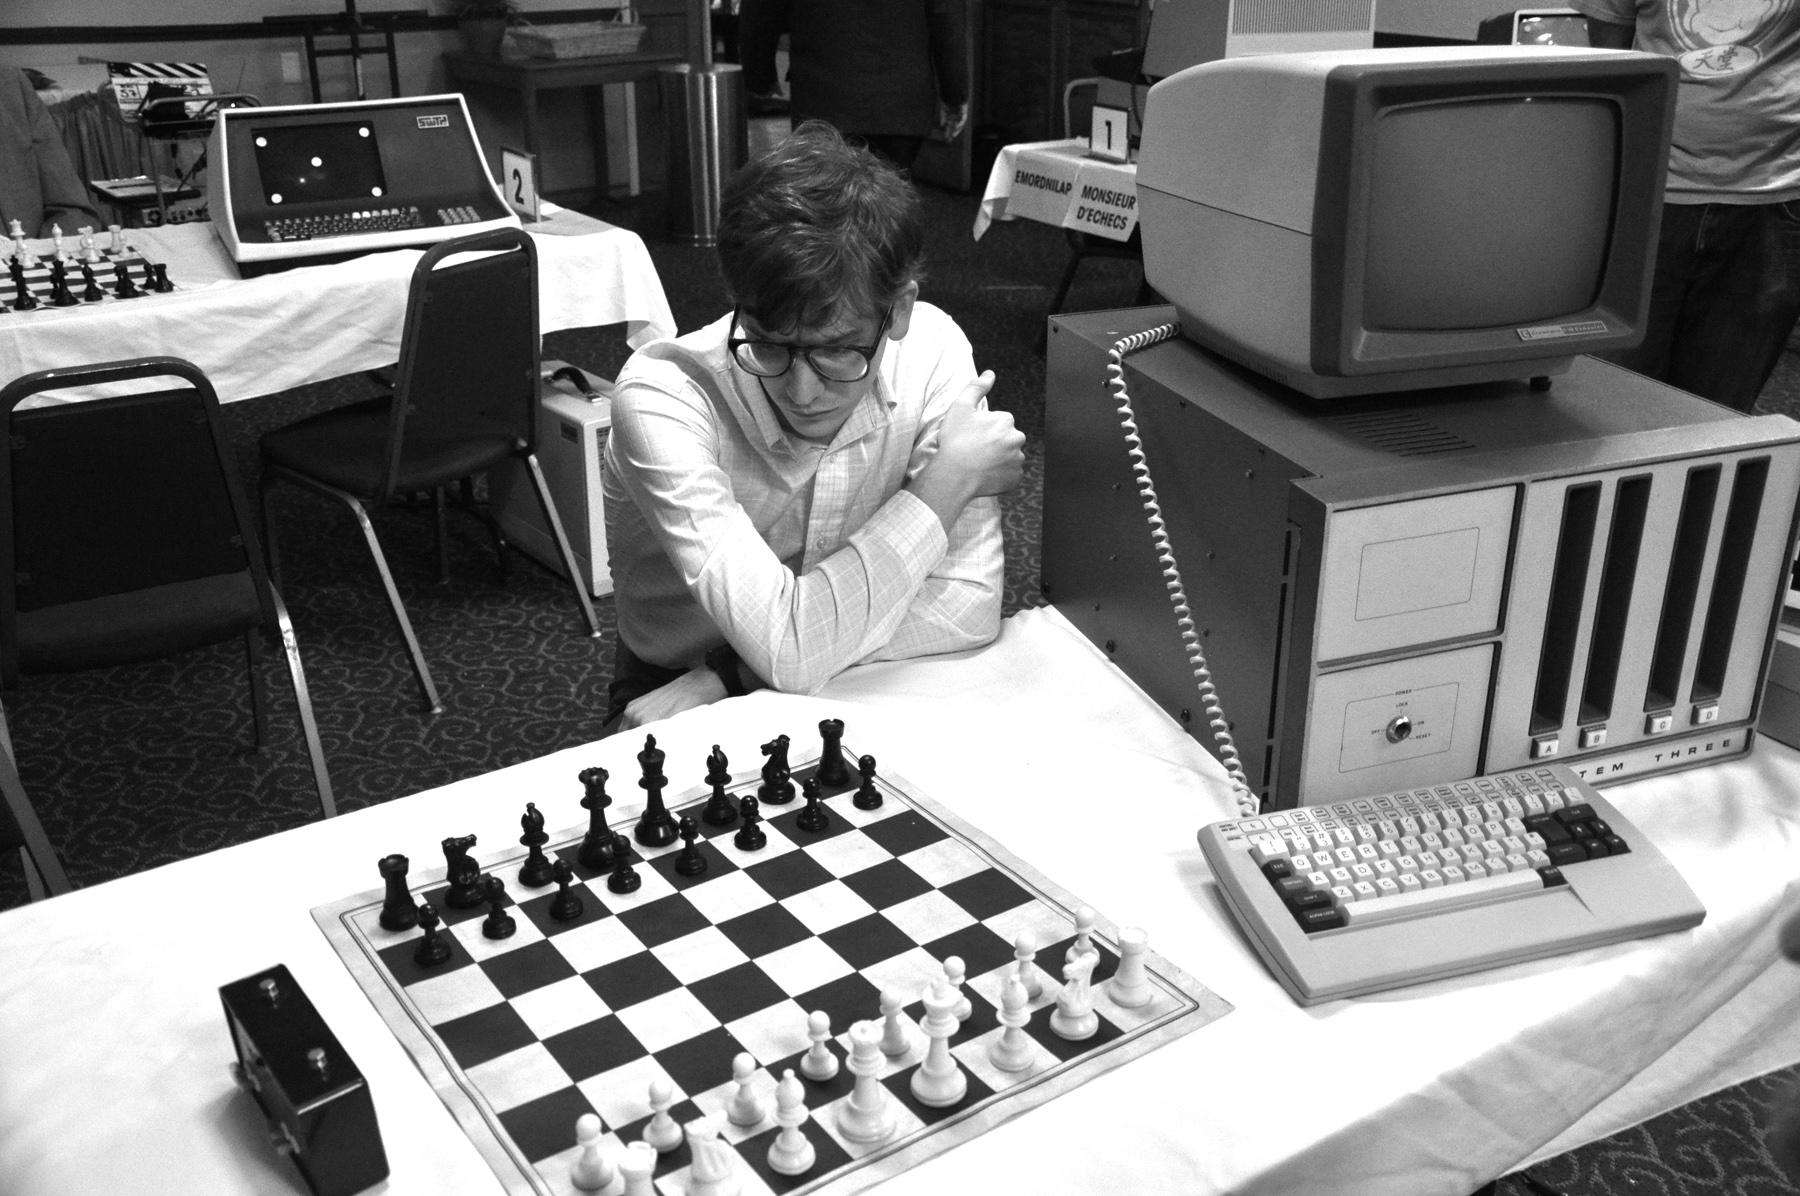 Computer Chess Austin Alamo Drafthouse Cinema